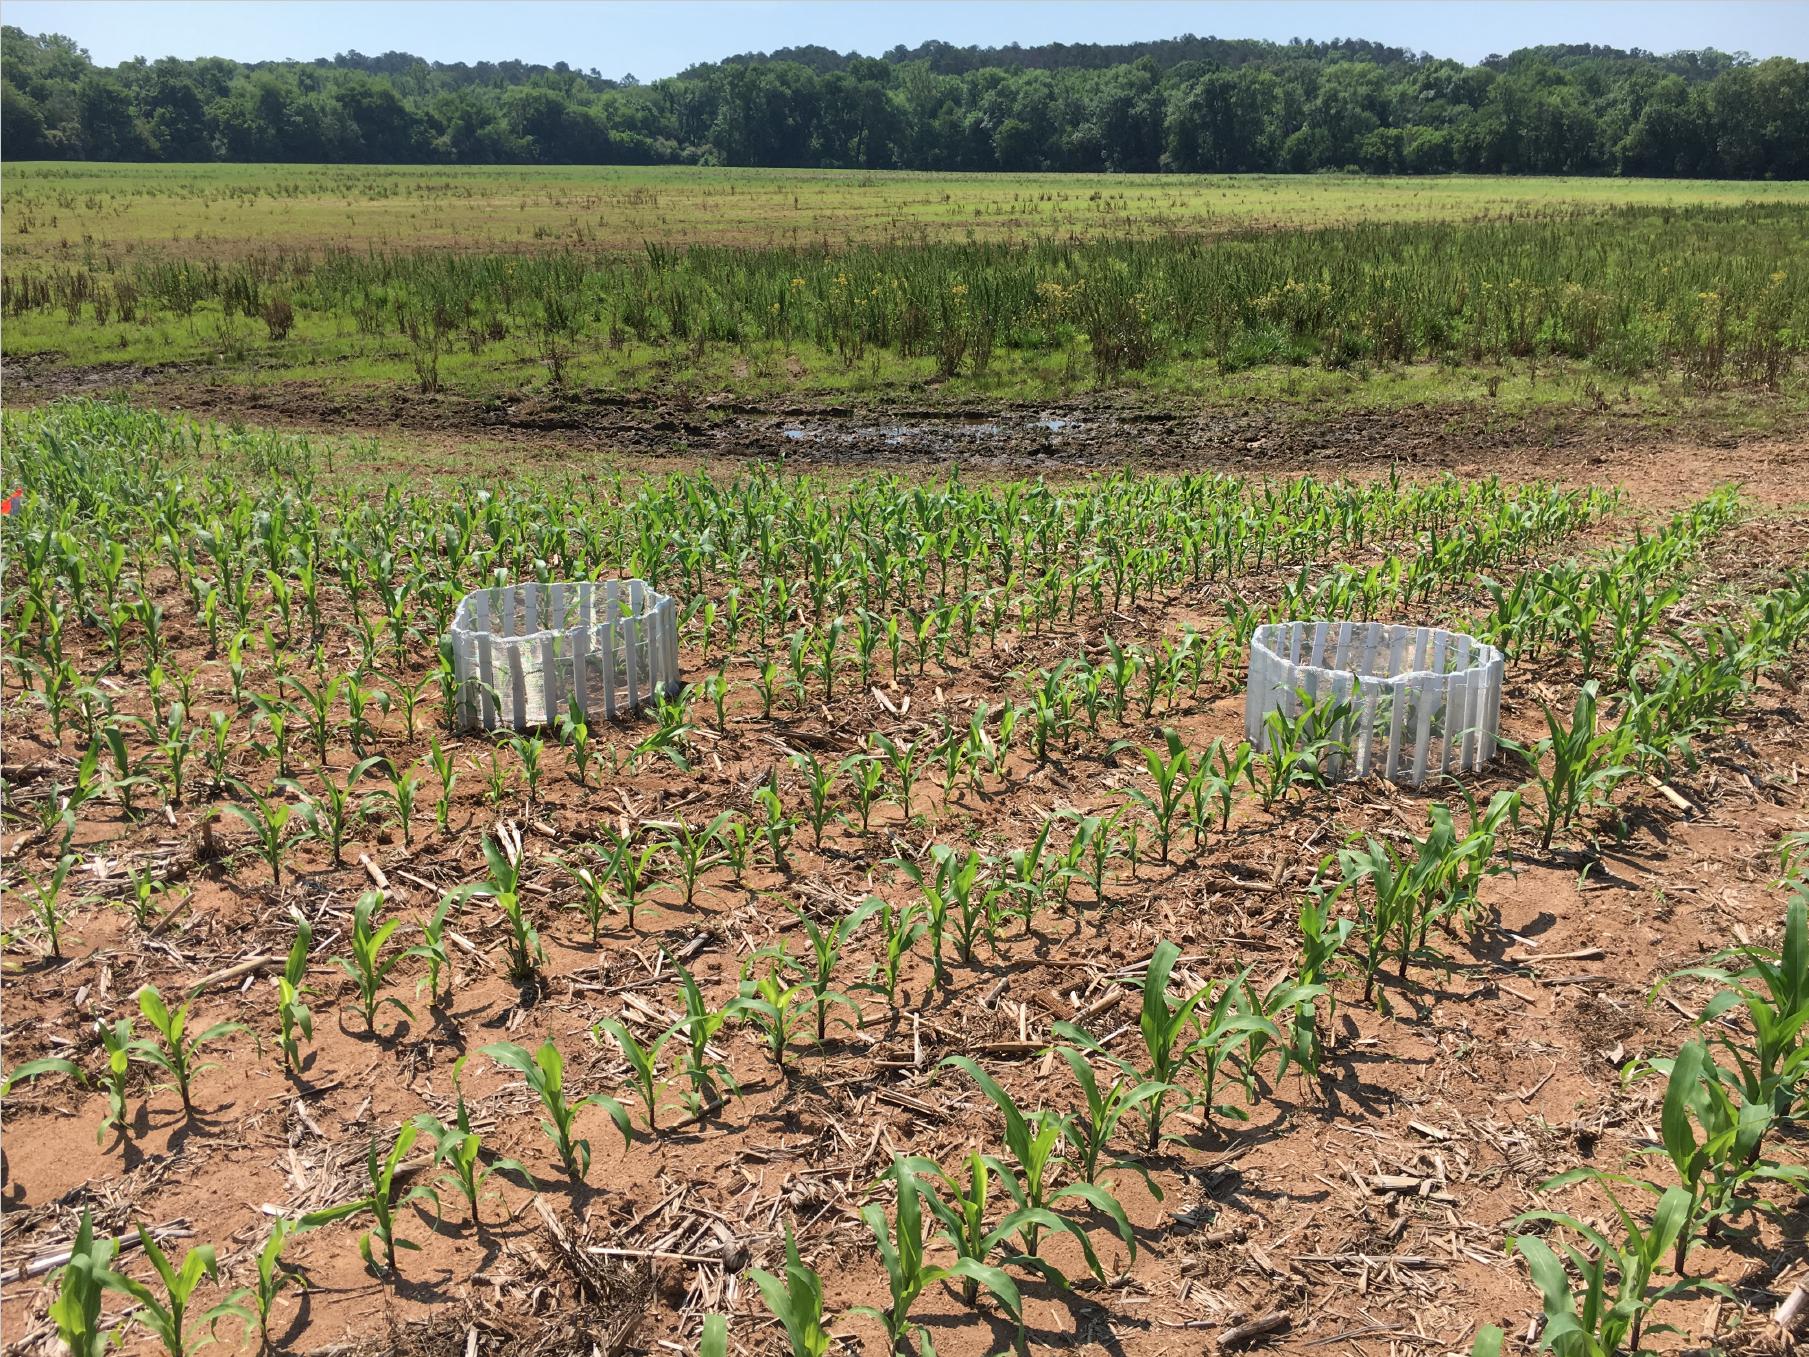 Wetland and corn field